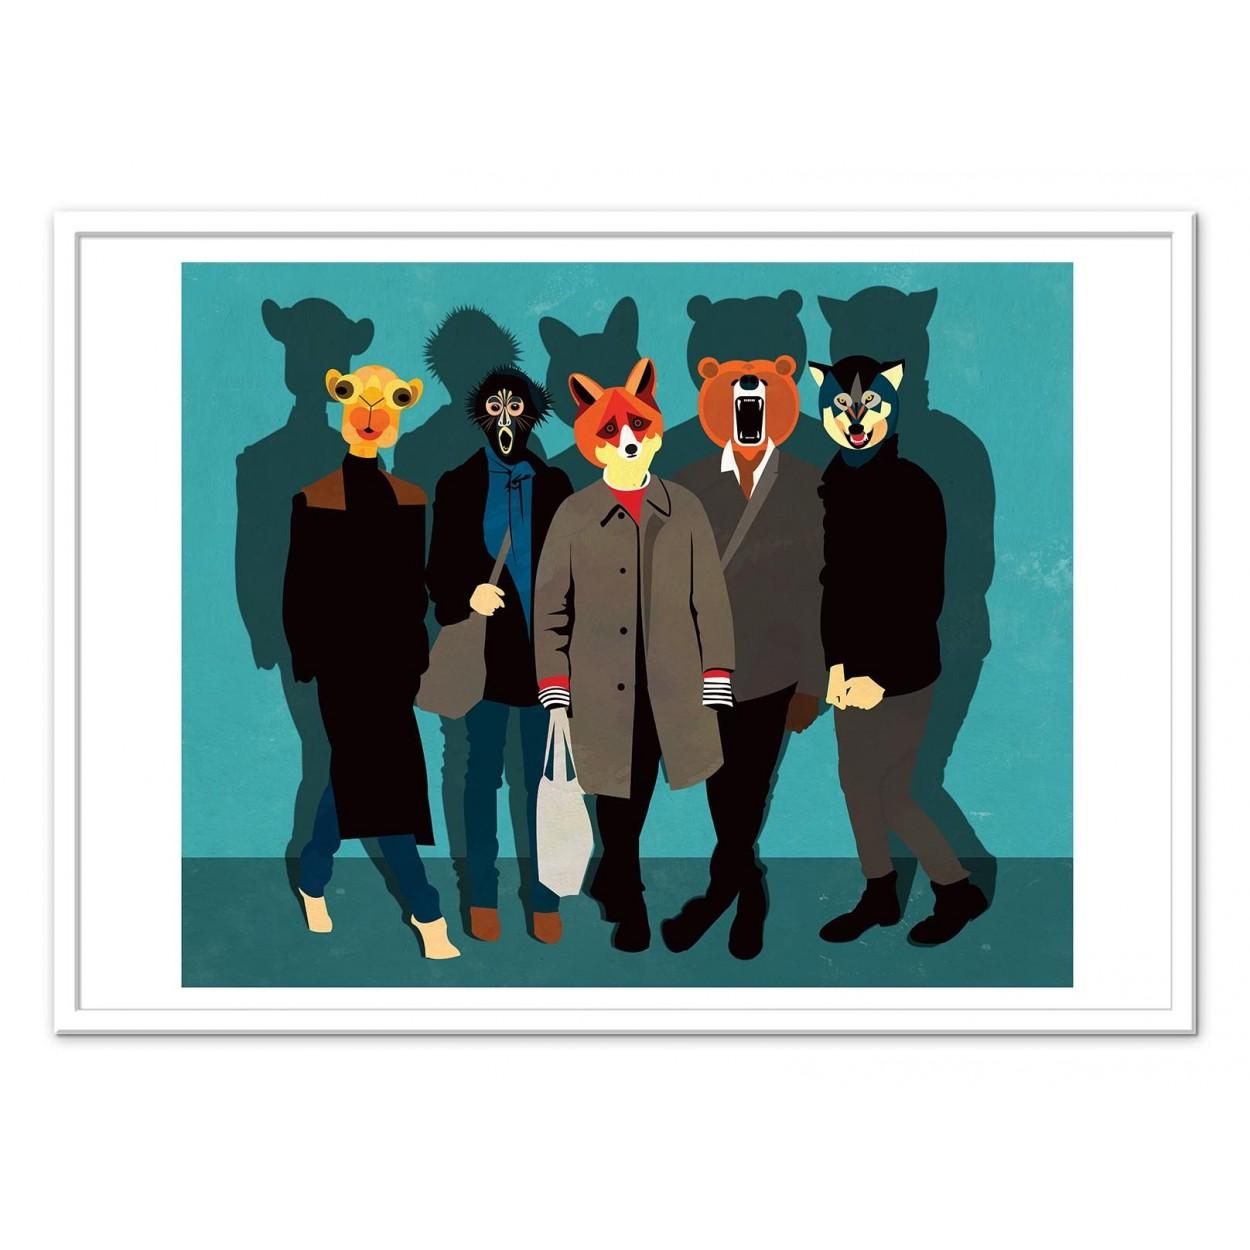 illustration art poster frame paint graphic of a gang of animals. Black Bedroom Furniture Sets. Home Design Ideas